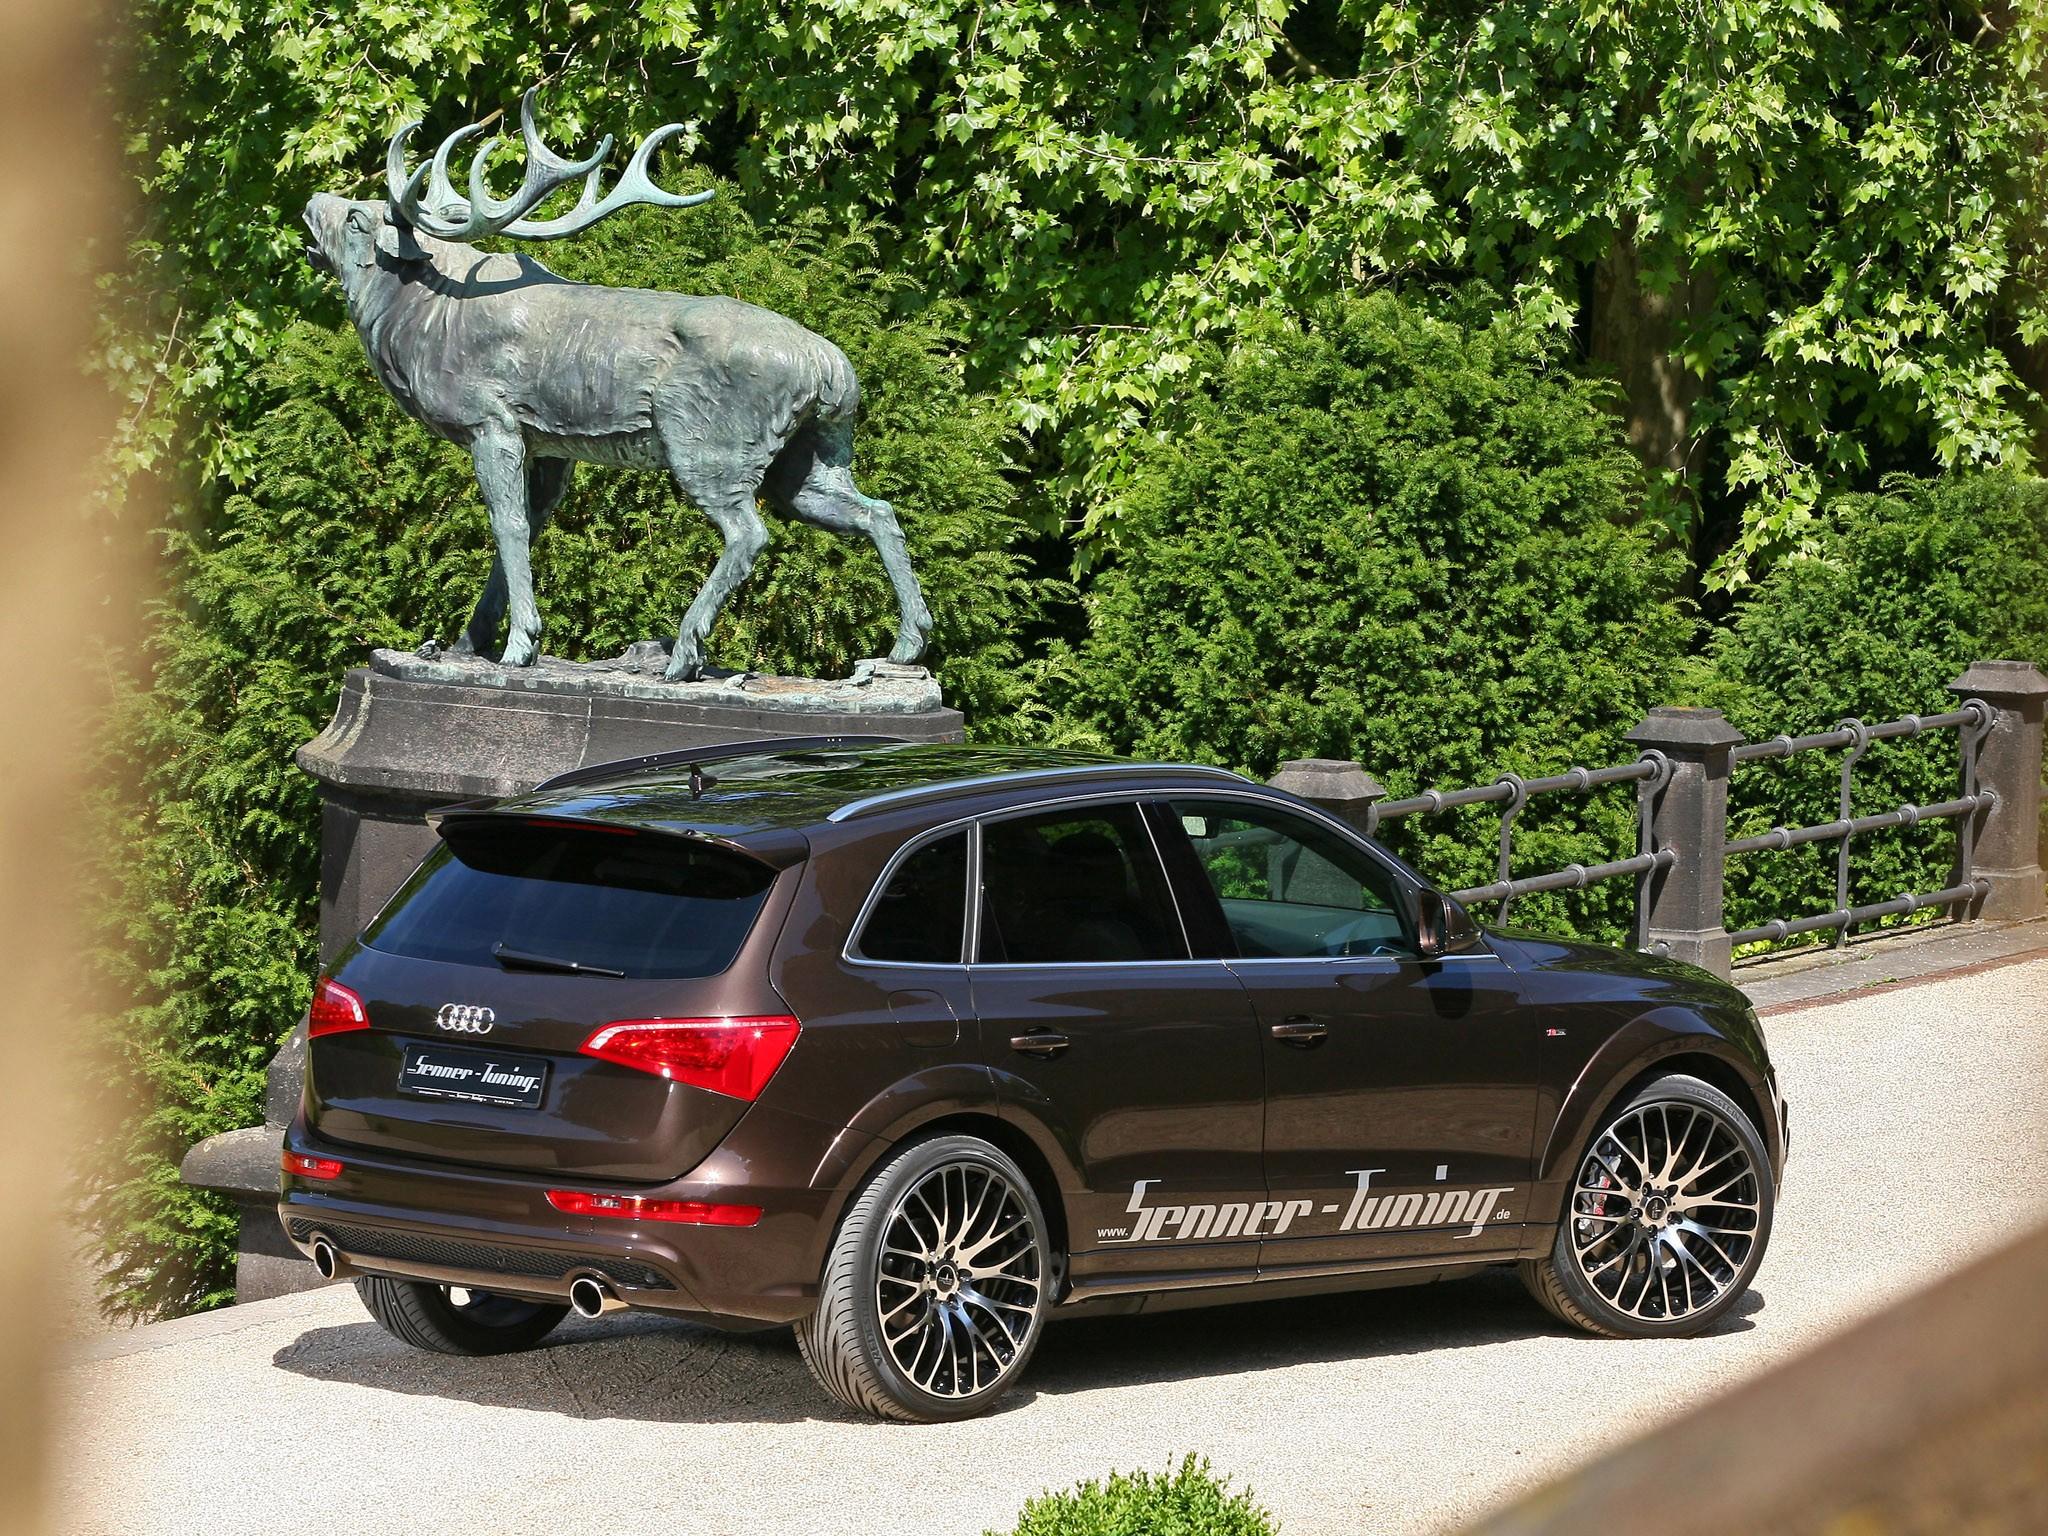 2011 Senner Audi Q5